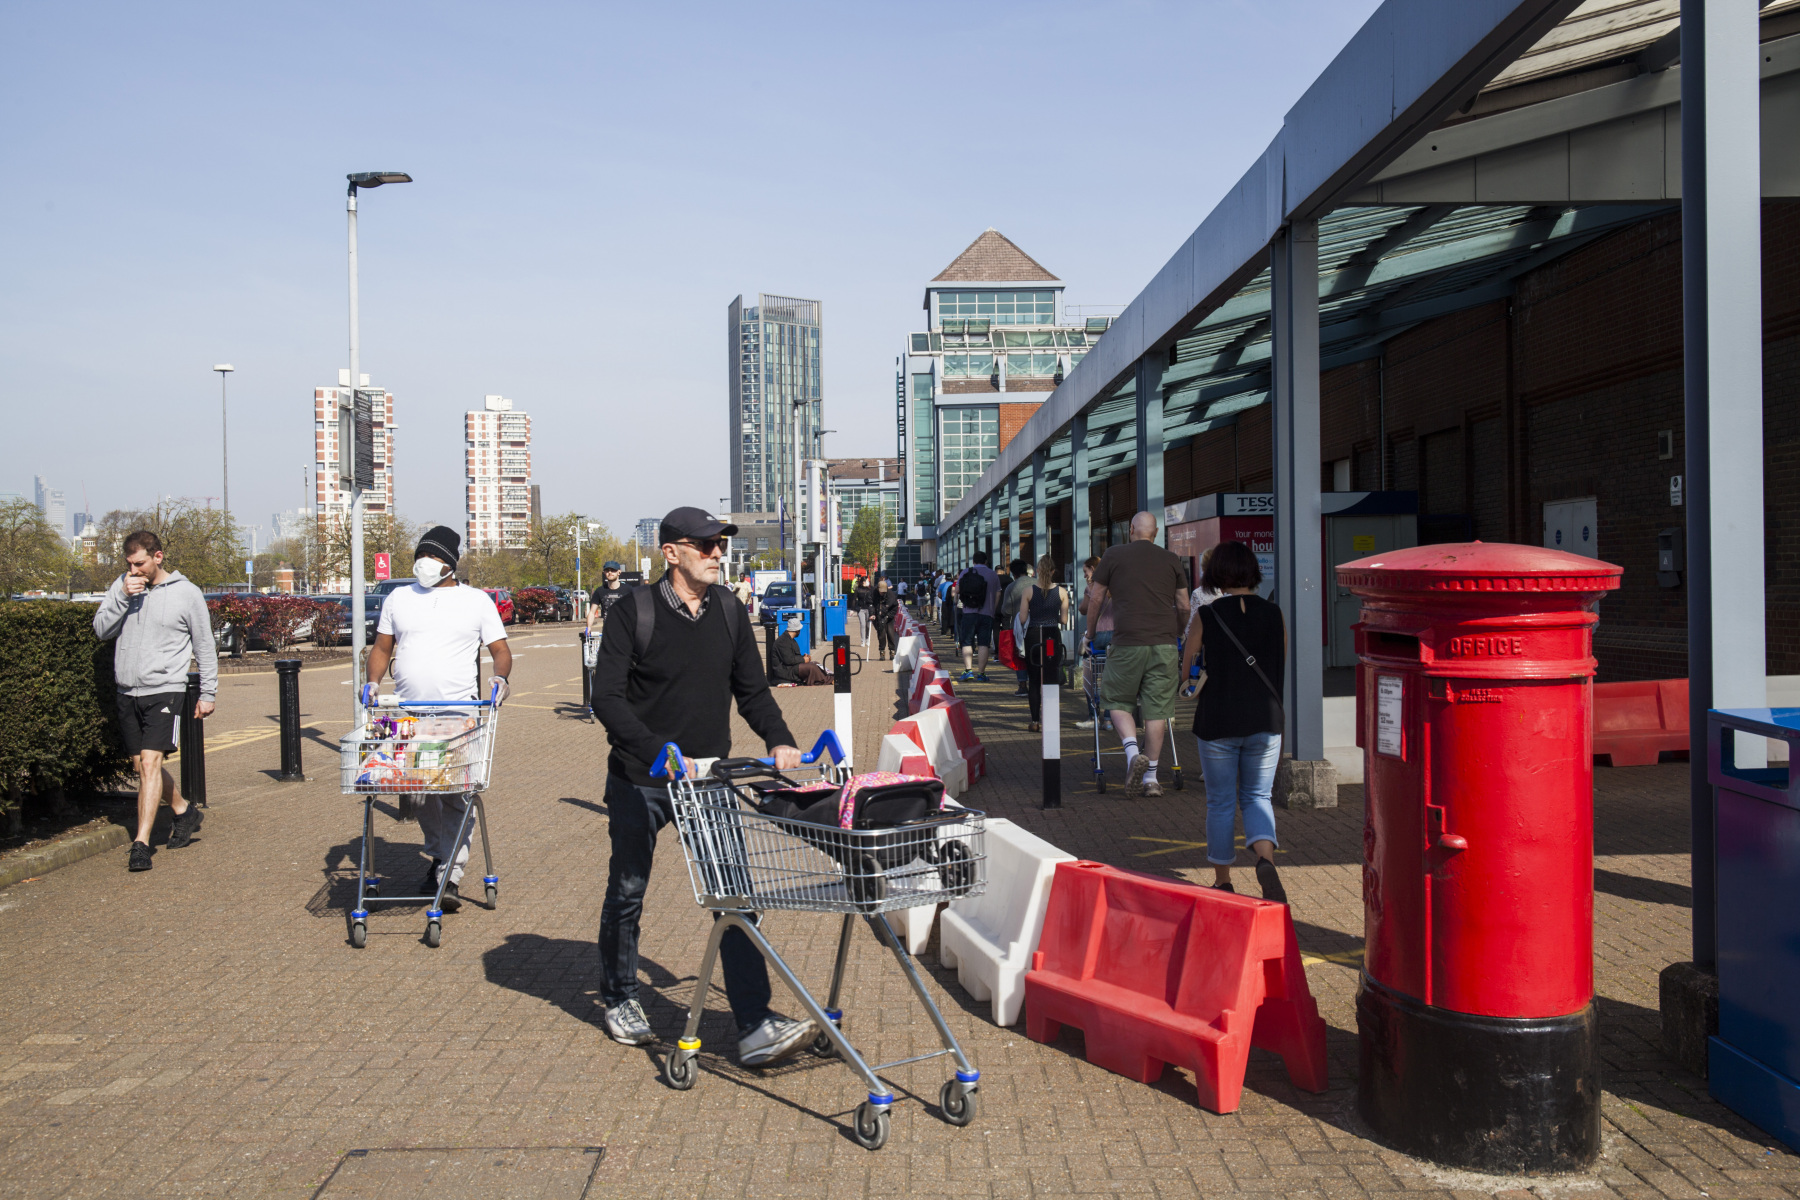 Tesco Supermarket, Surrey Quays, Good Friday, North Rotherhithe, Southwark, London